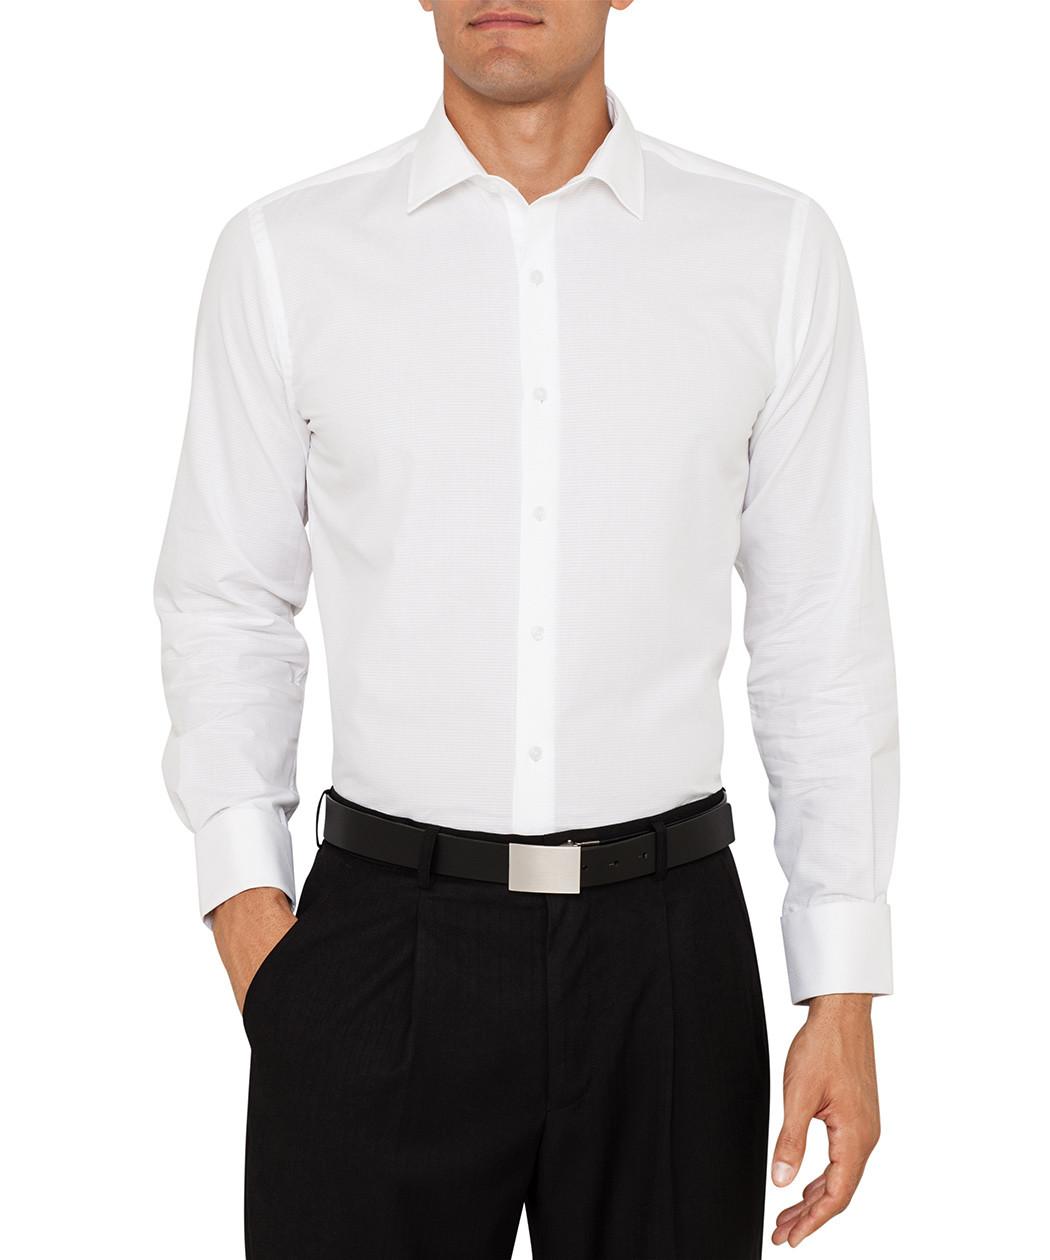 Van heusen cotton textured weave slim fit dress shirt for Van heusen dress shirts